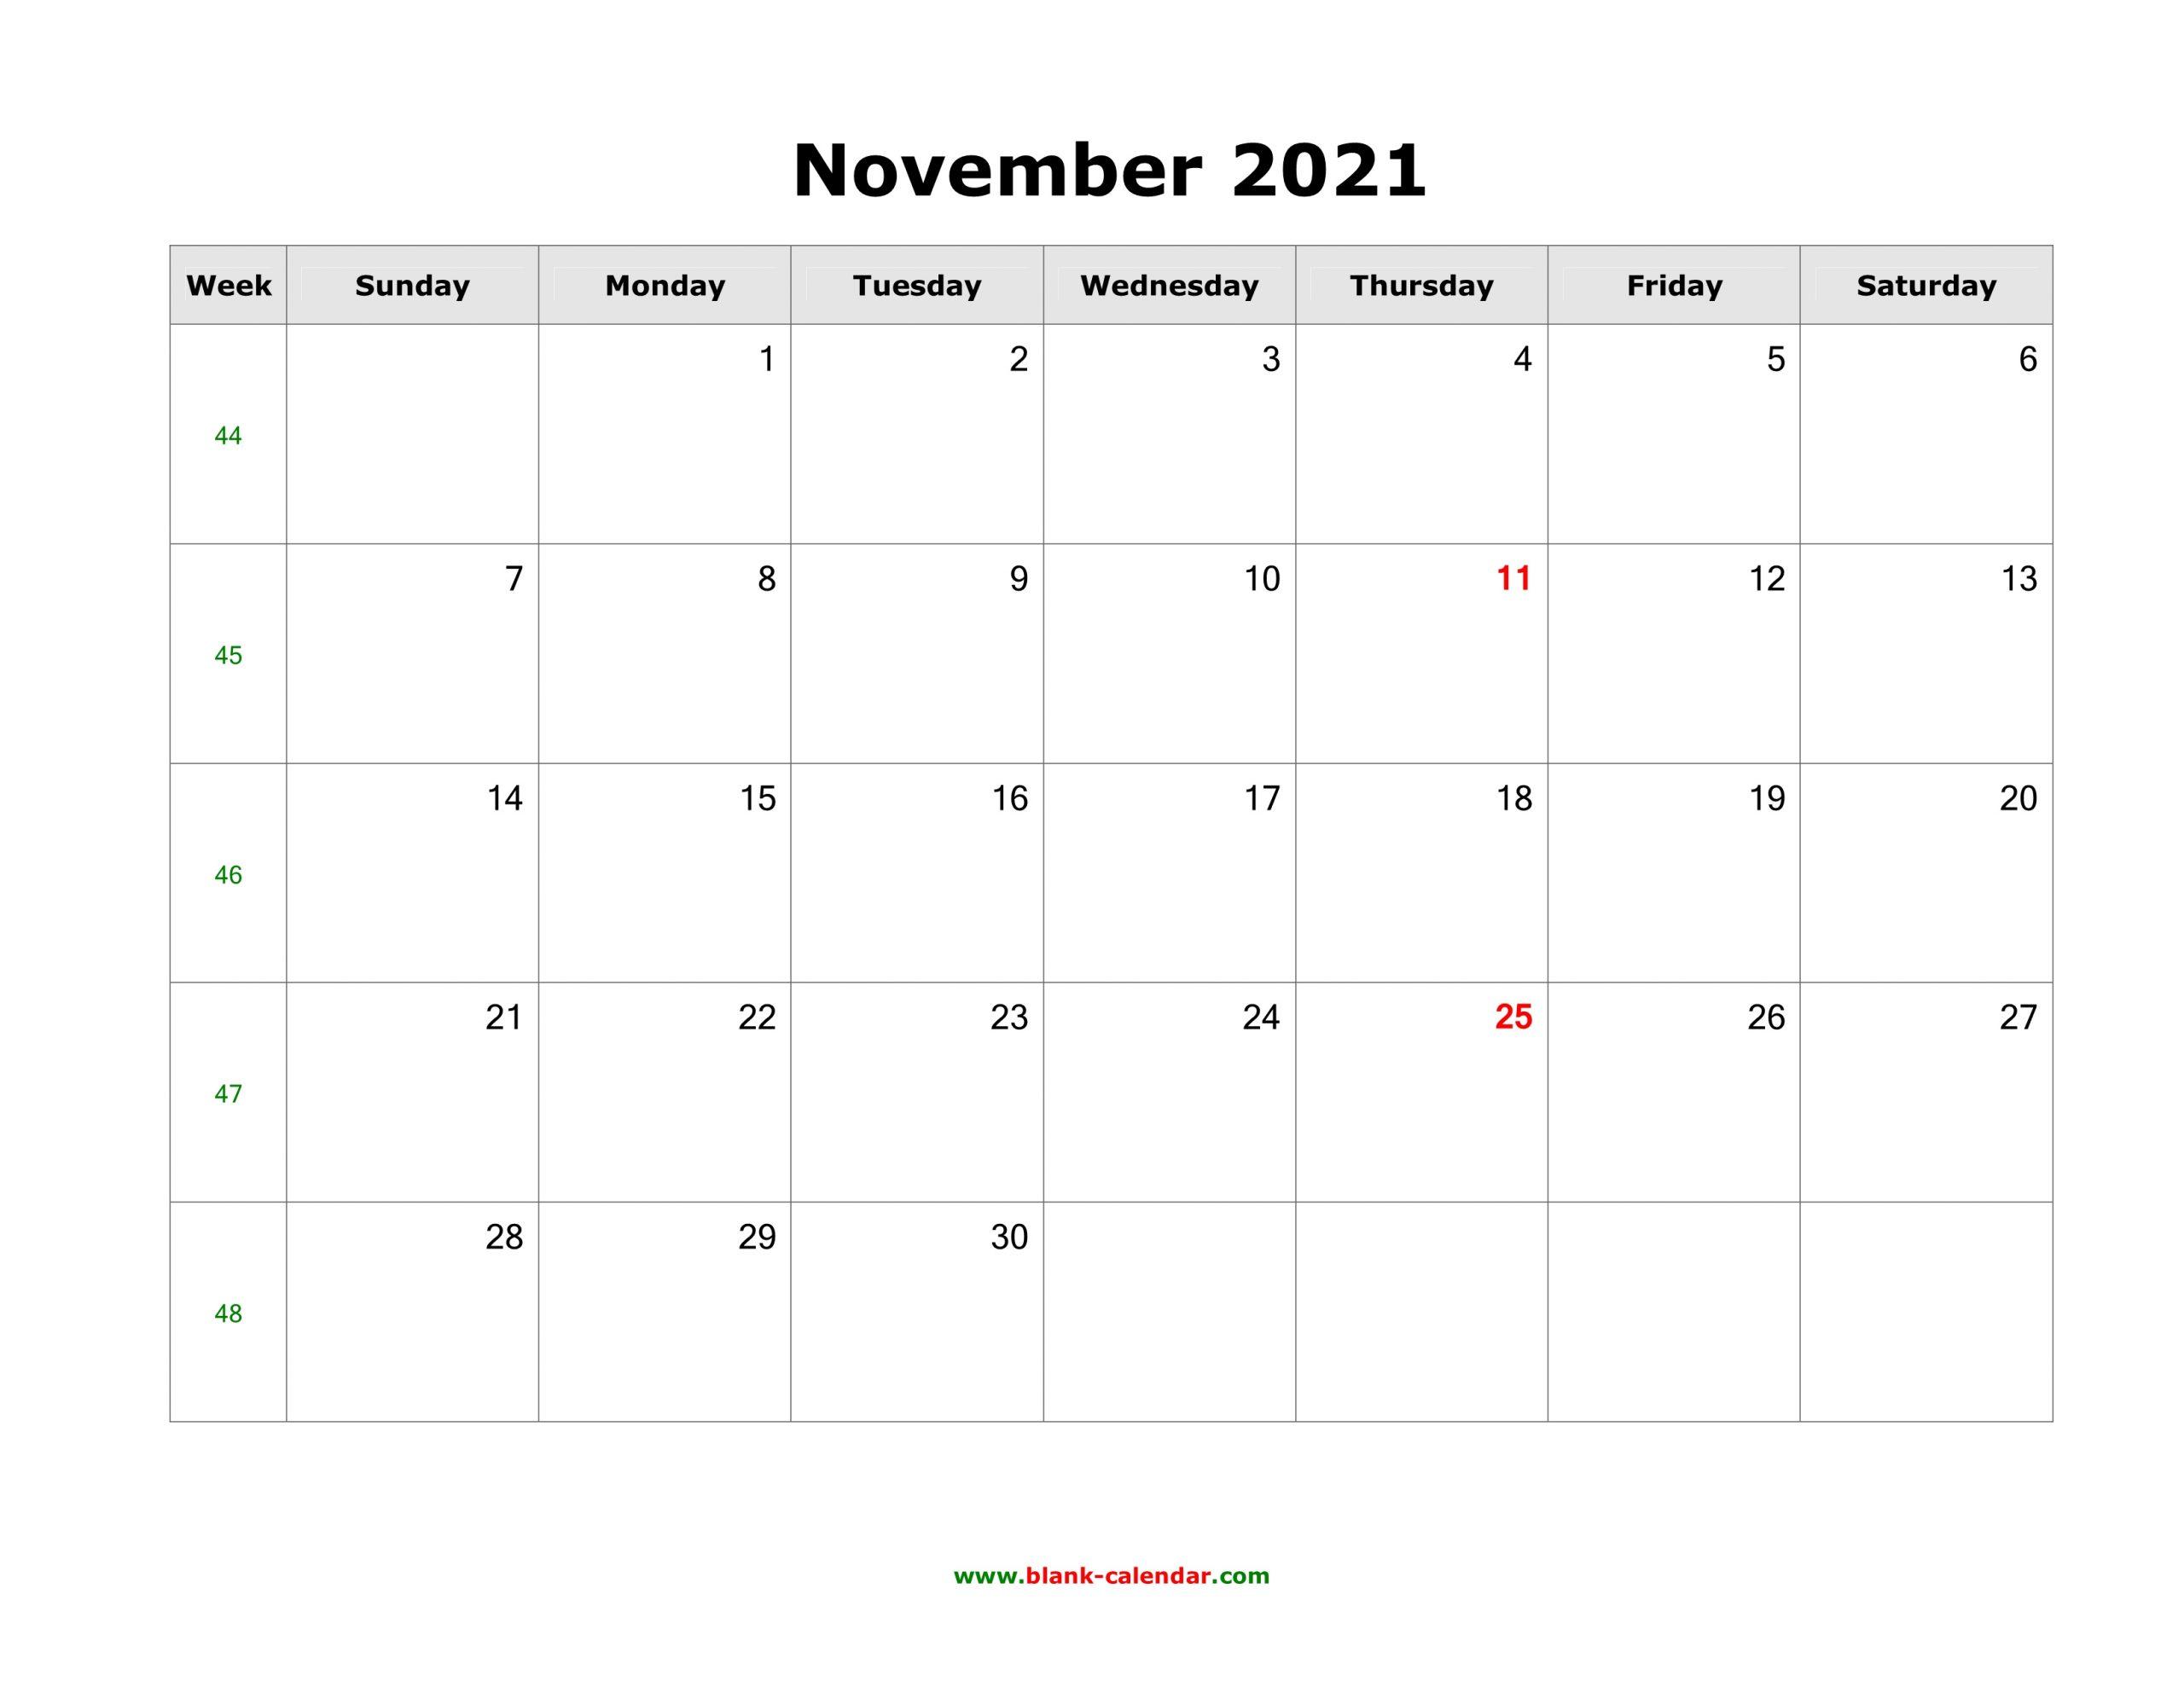 Download November 2021 Blank Calendar (Horizontal) November 2021 Calendar To Print